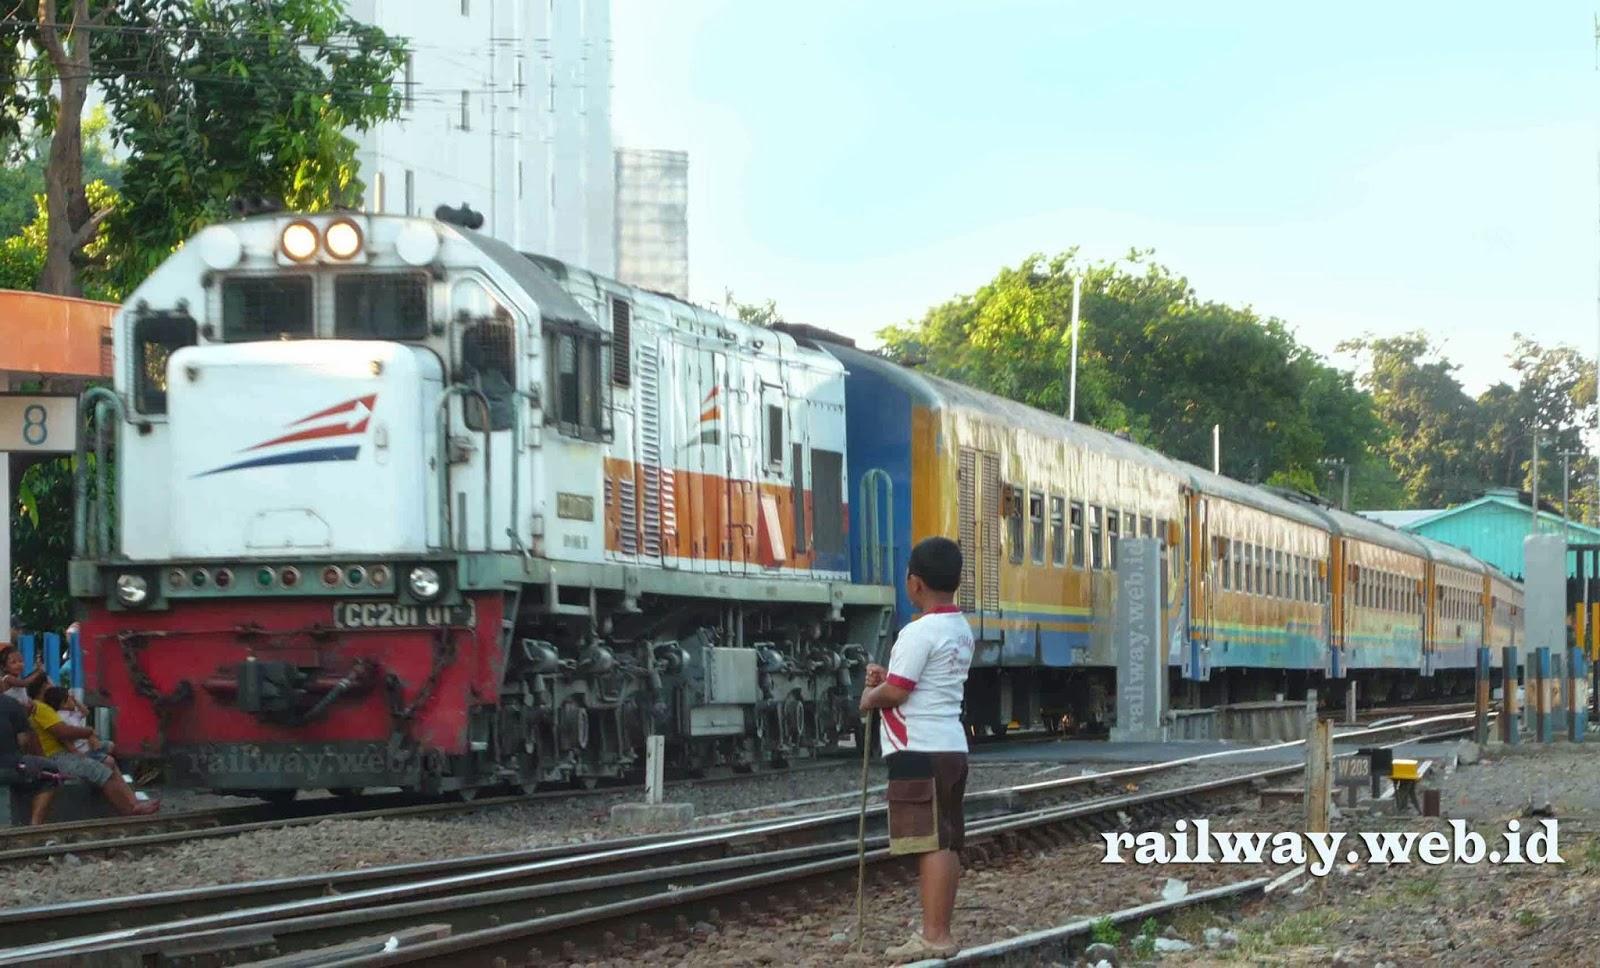 Inilah Jadwal Kereta Api Stasiun Semarang Tawang dan